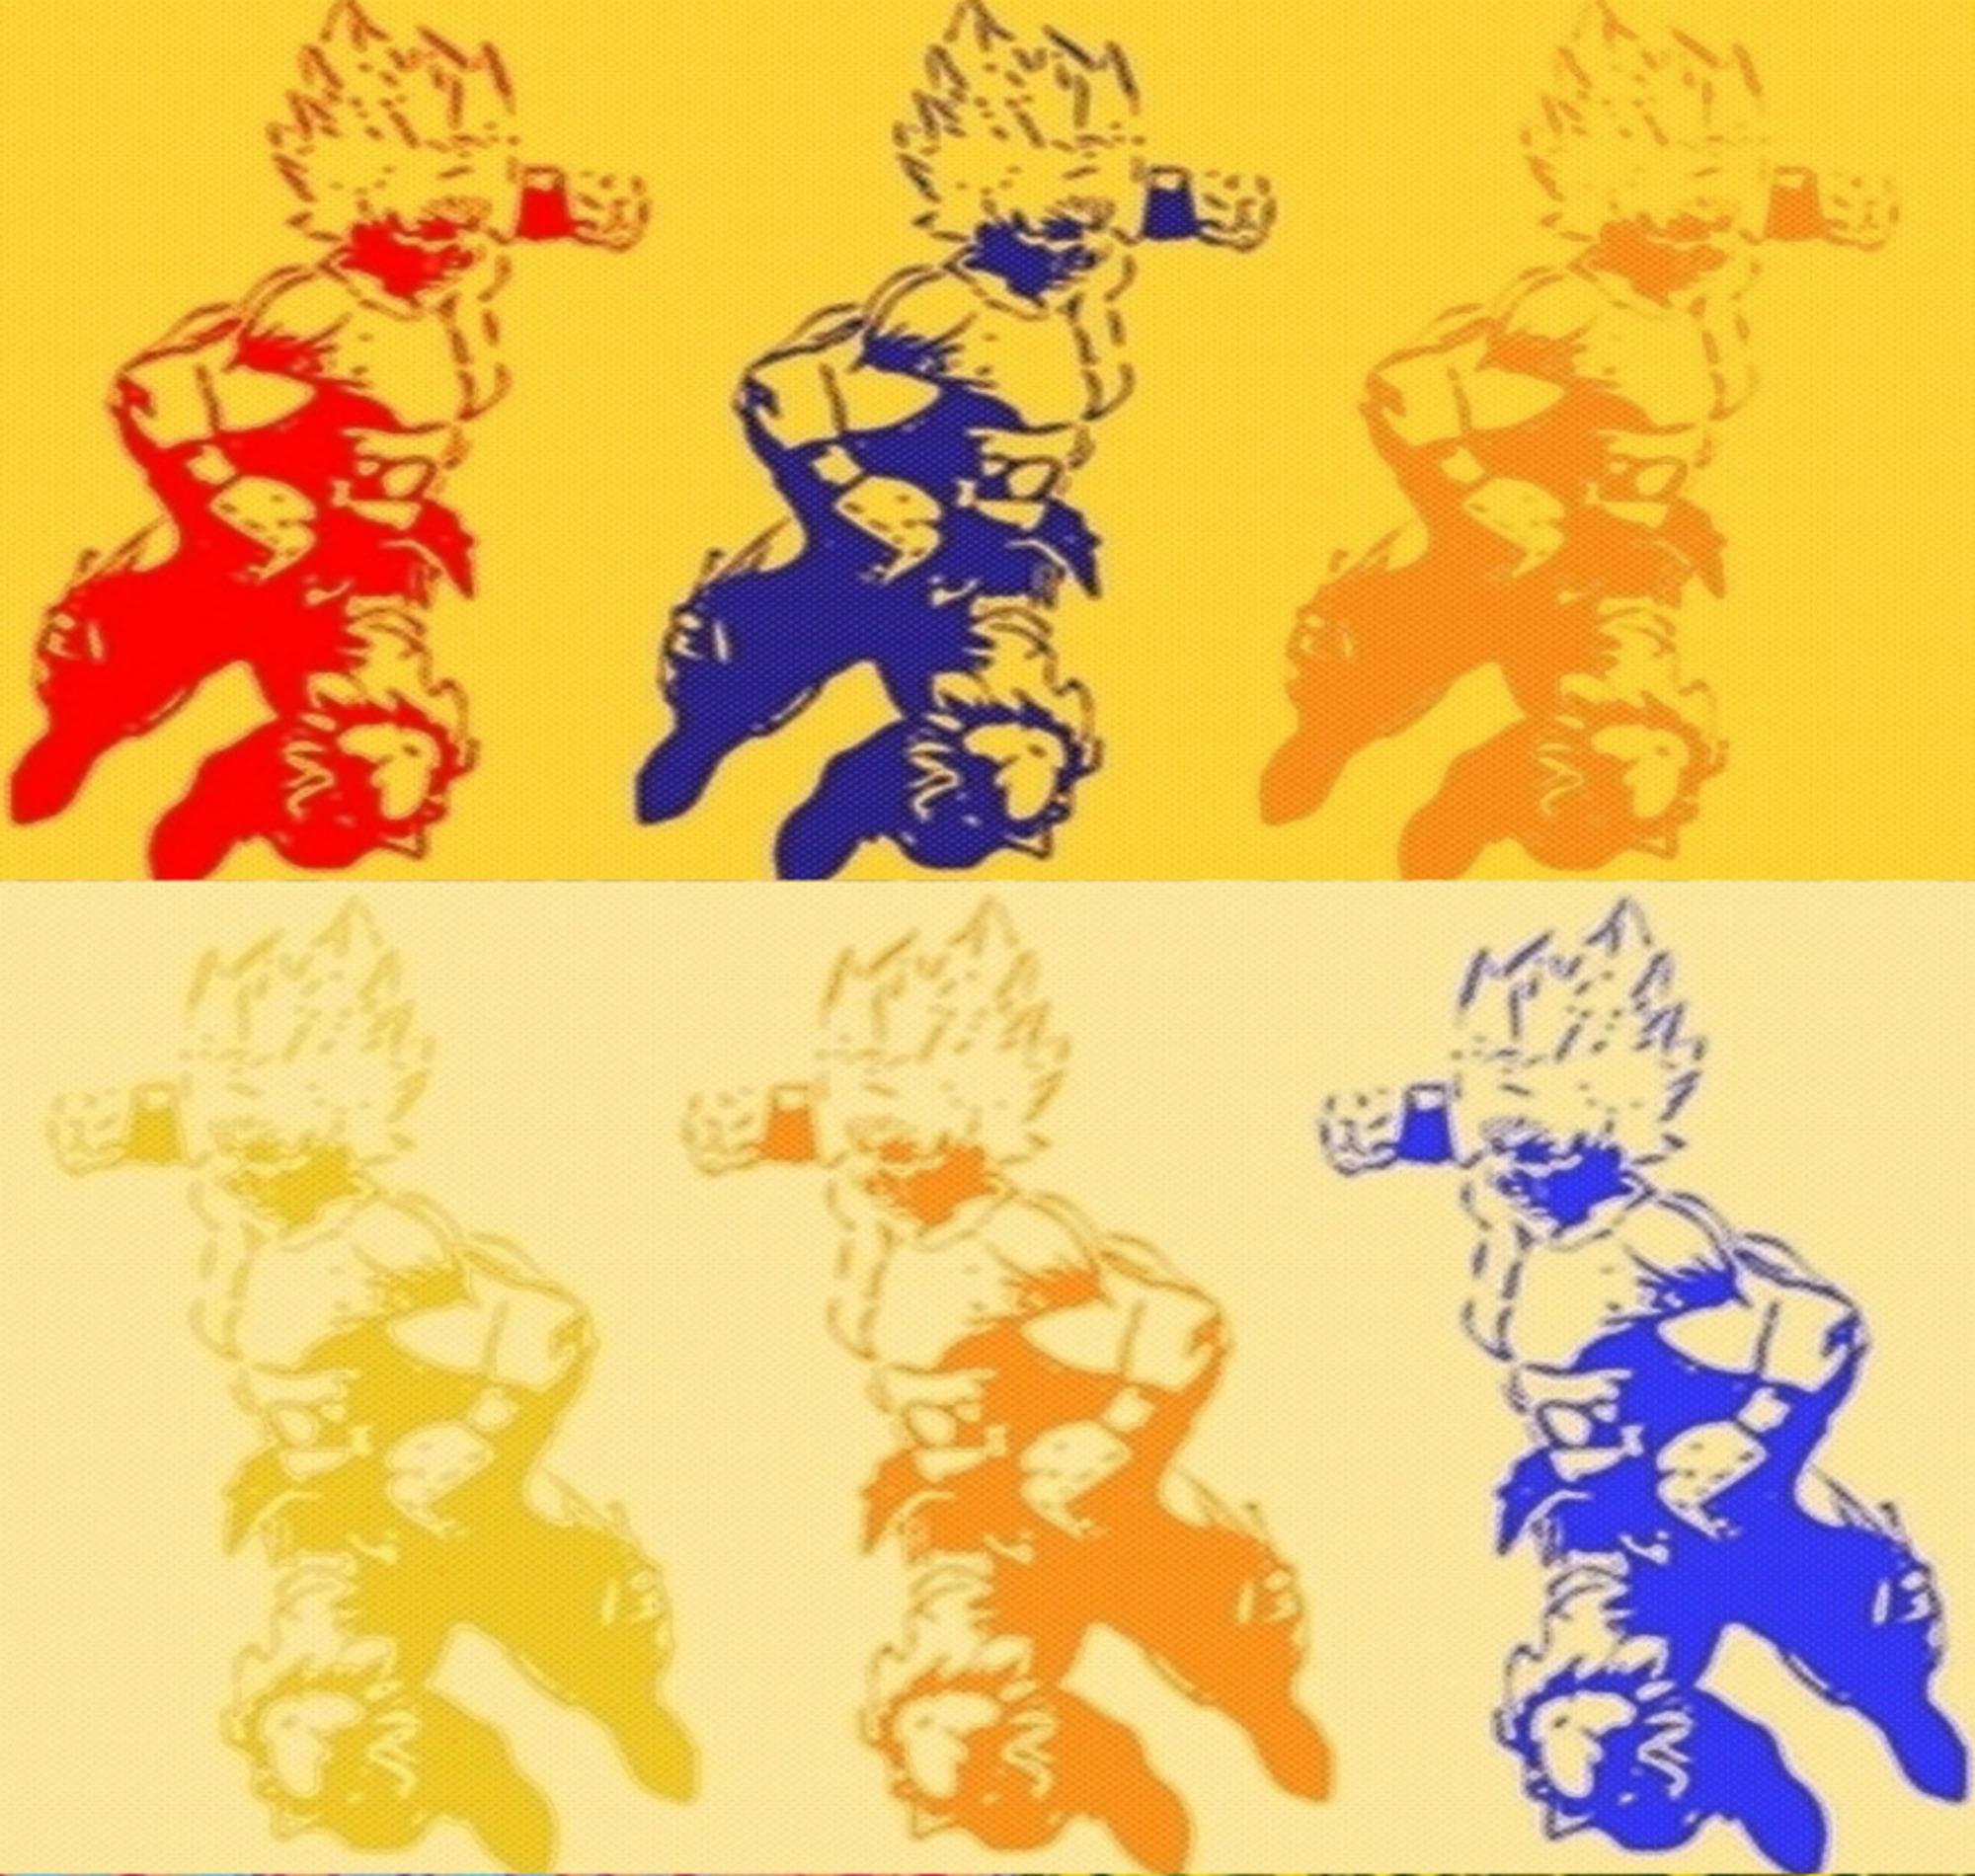 Dragonball Z Son Goku Super Sayan Pop Art